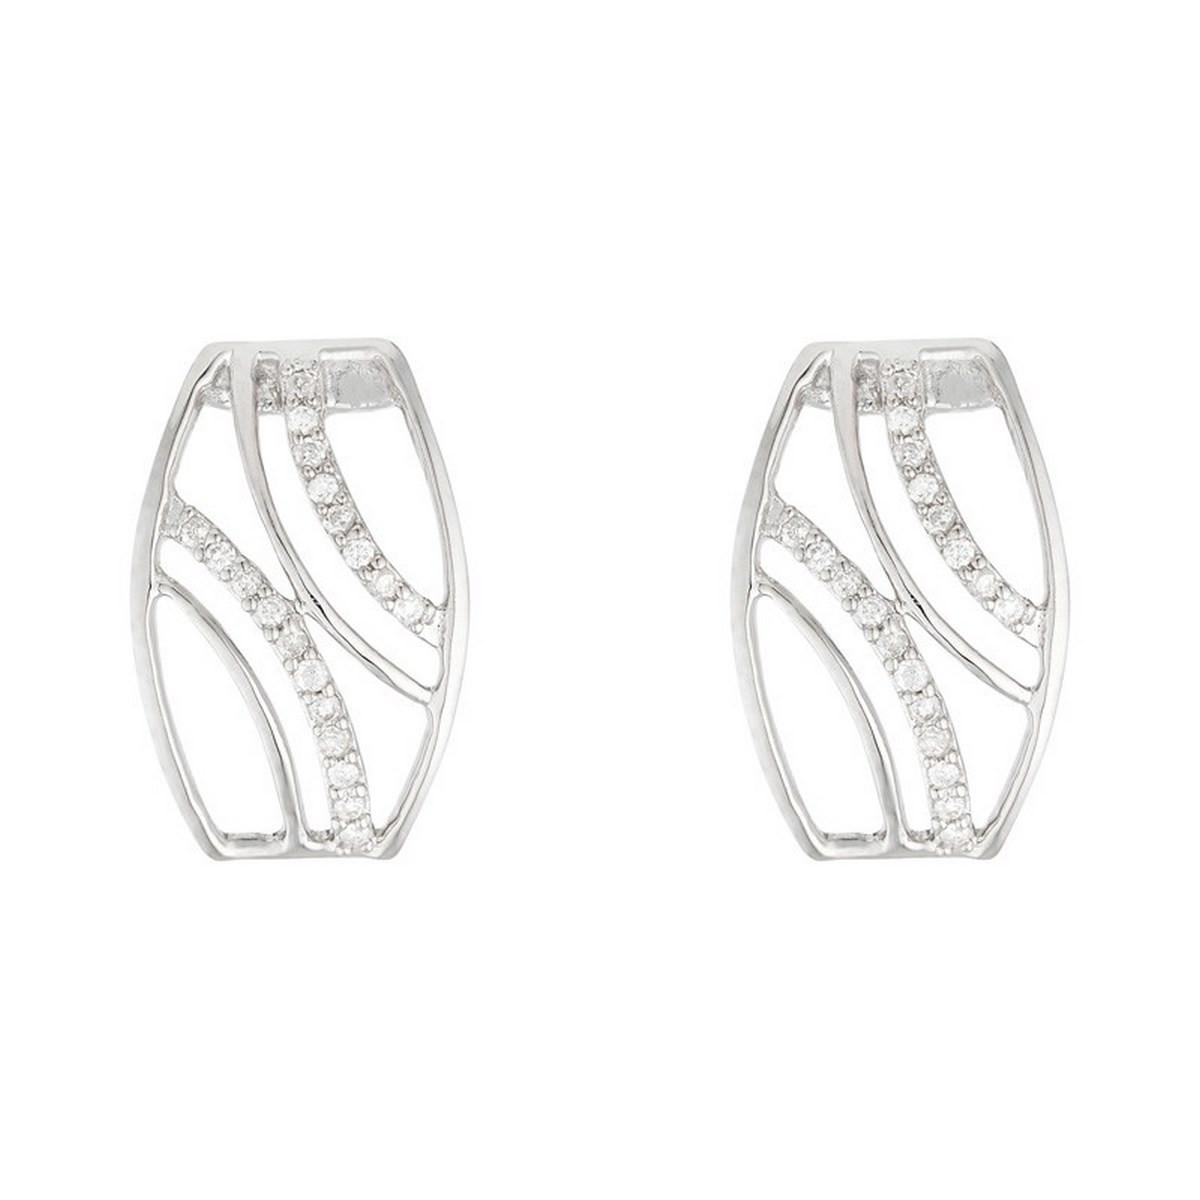 "Boucles d'oreilles Or Blanc ""SHÉHÉRAZADE"" Diamants 0,11 carat"